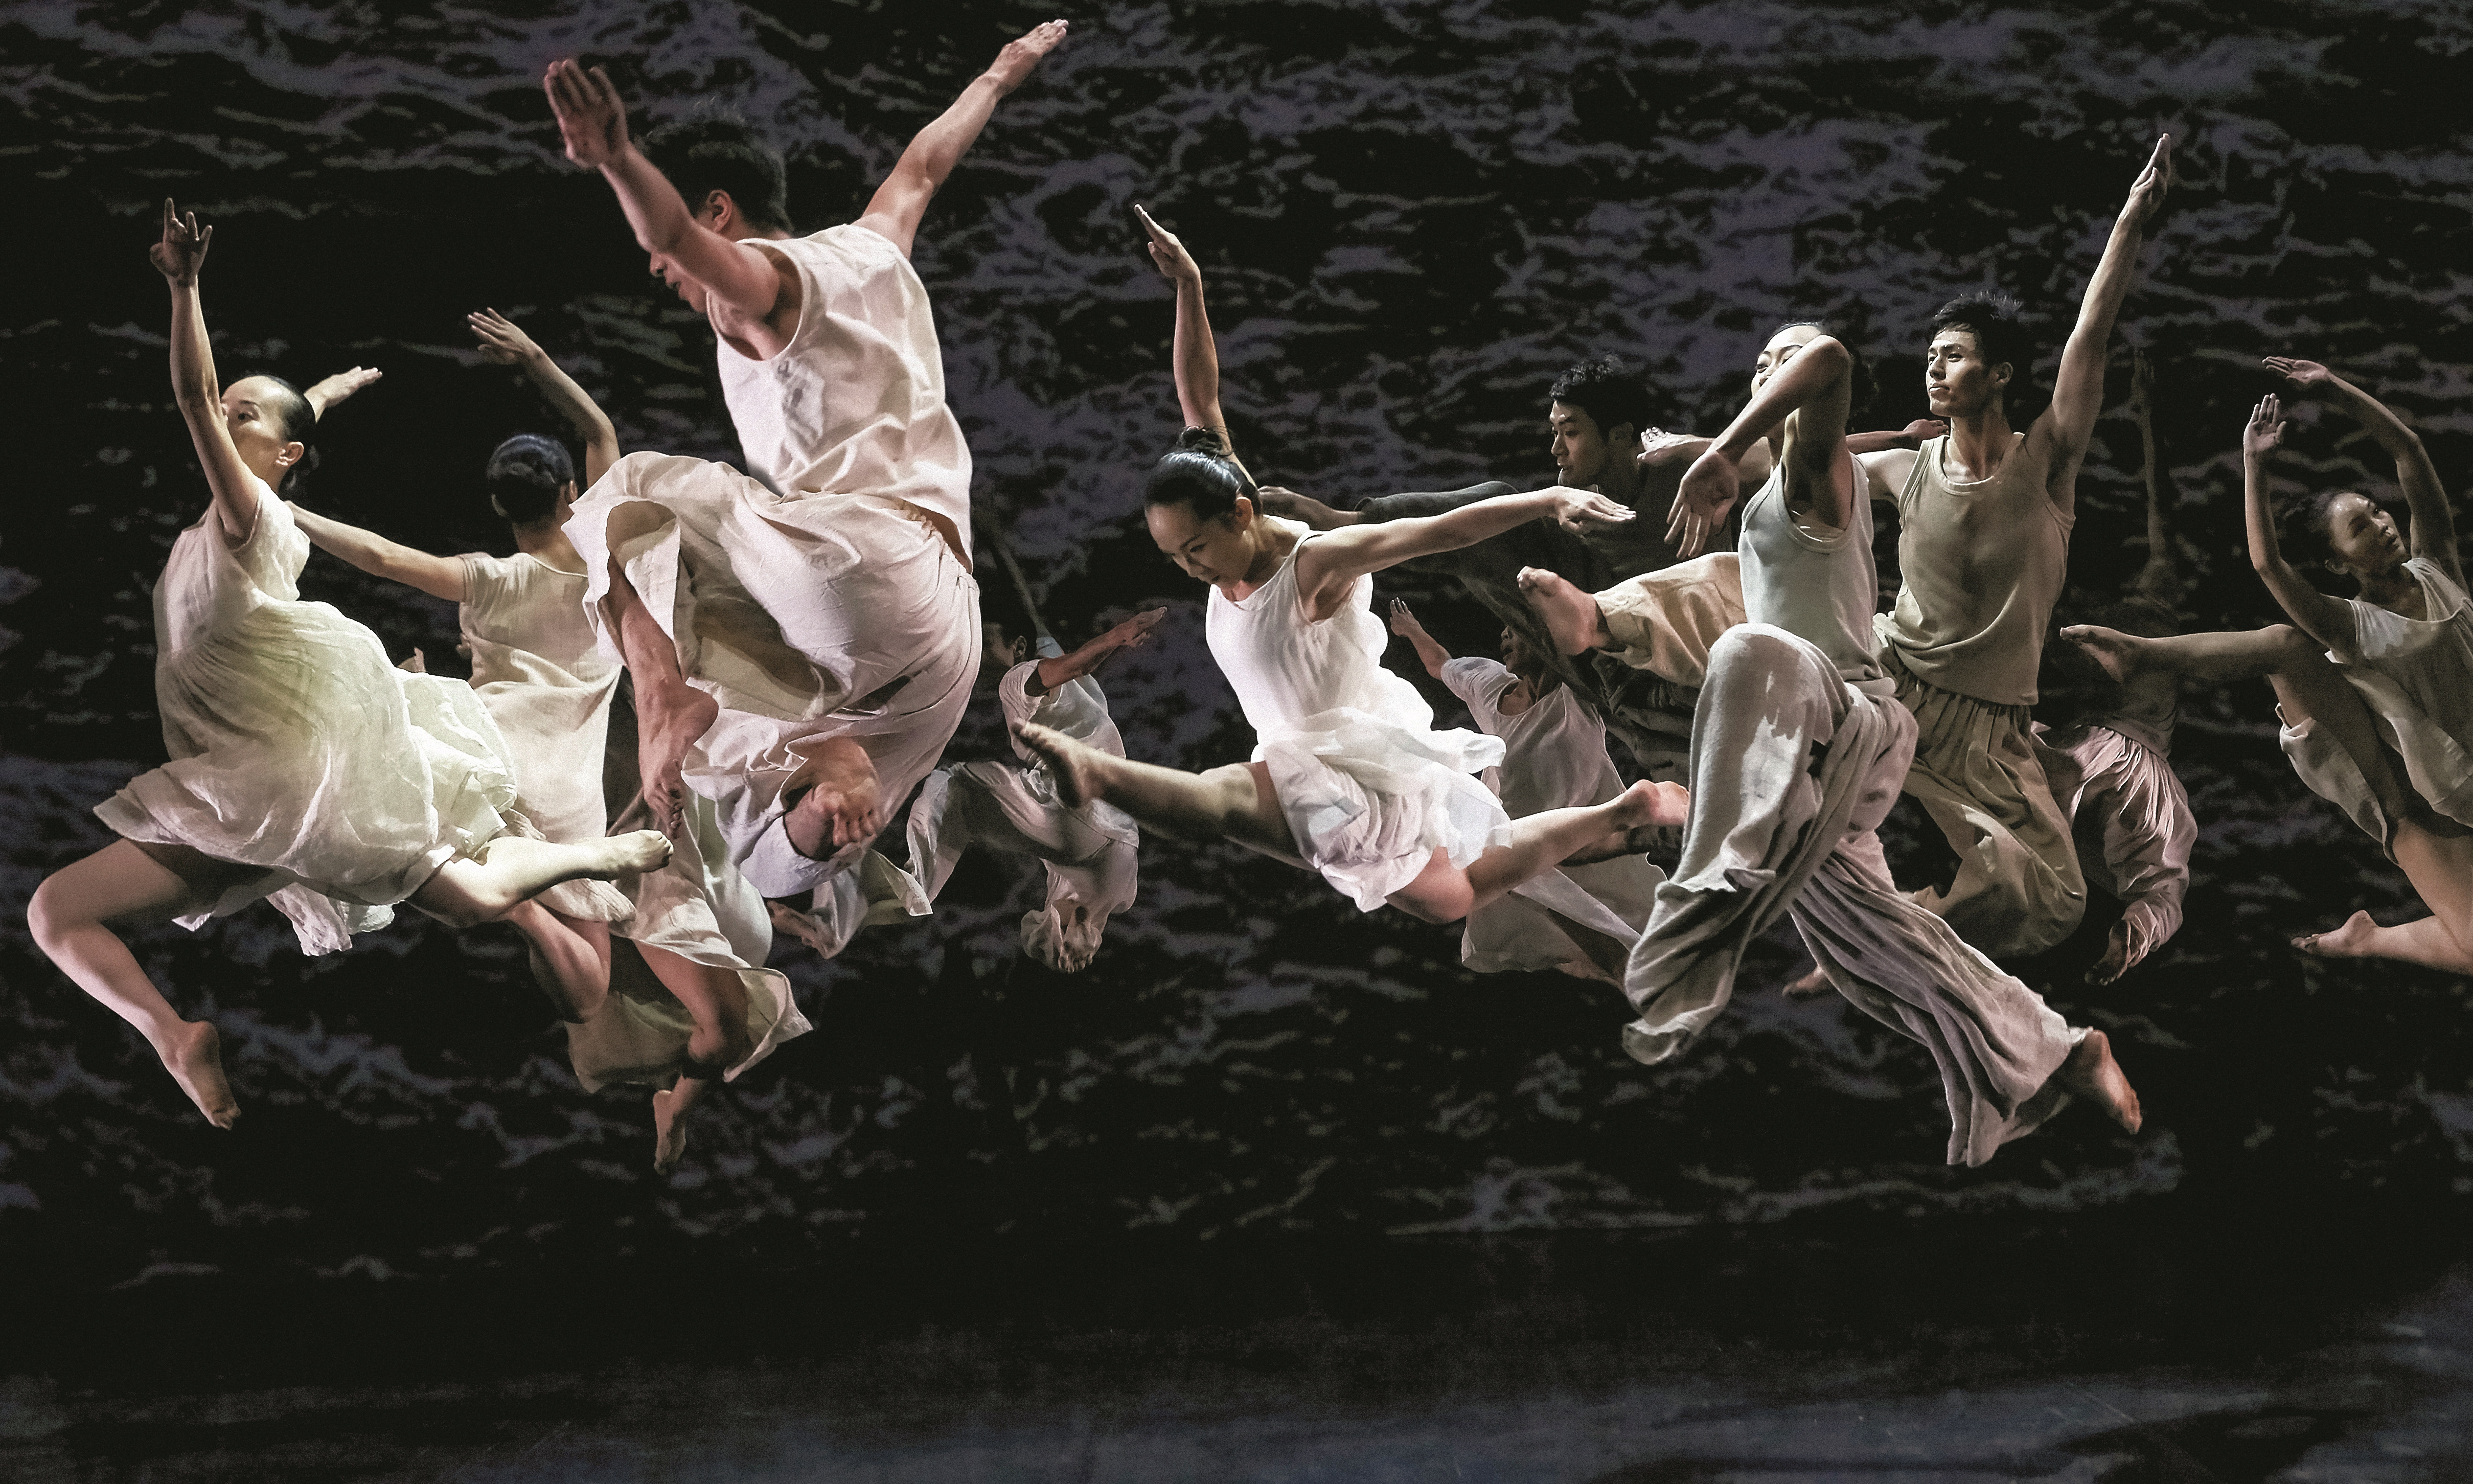 5cd268e2aa5b Cloud Gate Dance Theatre choreographer Lin Hwai-min's career celebrated  after a life dedicated to dance